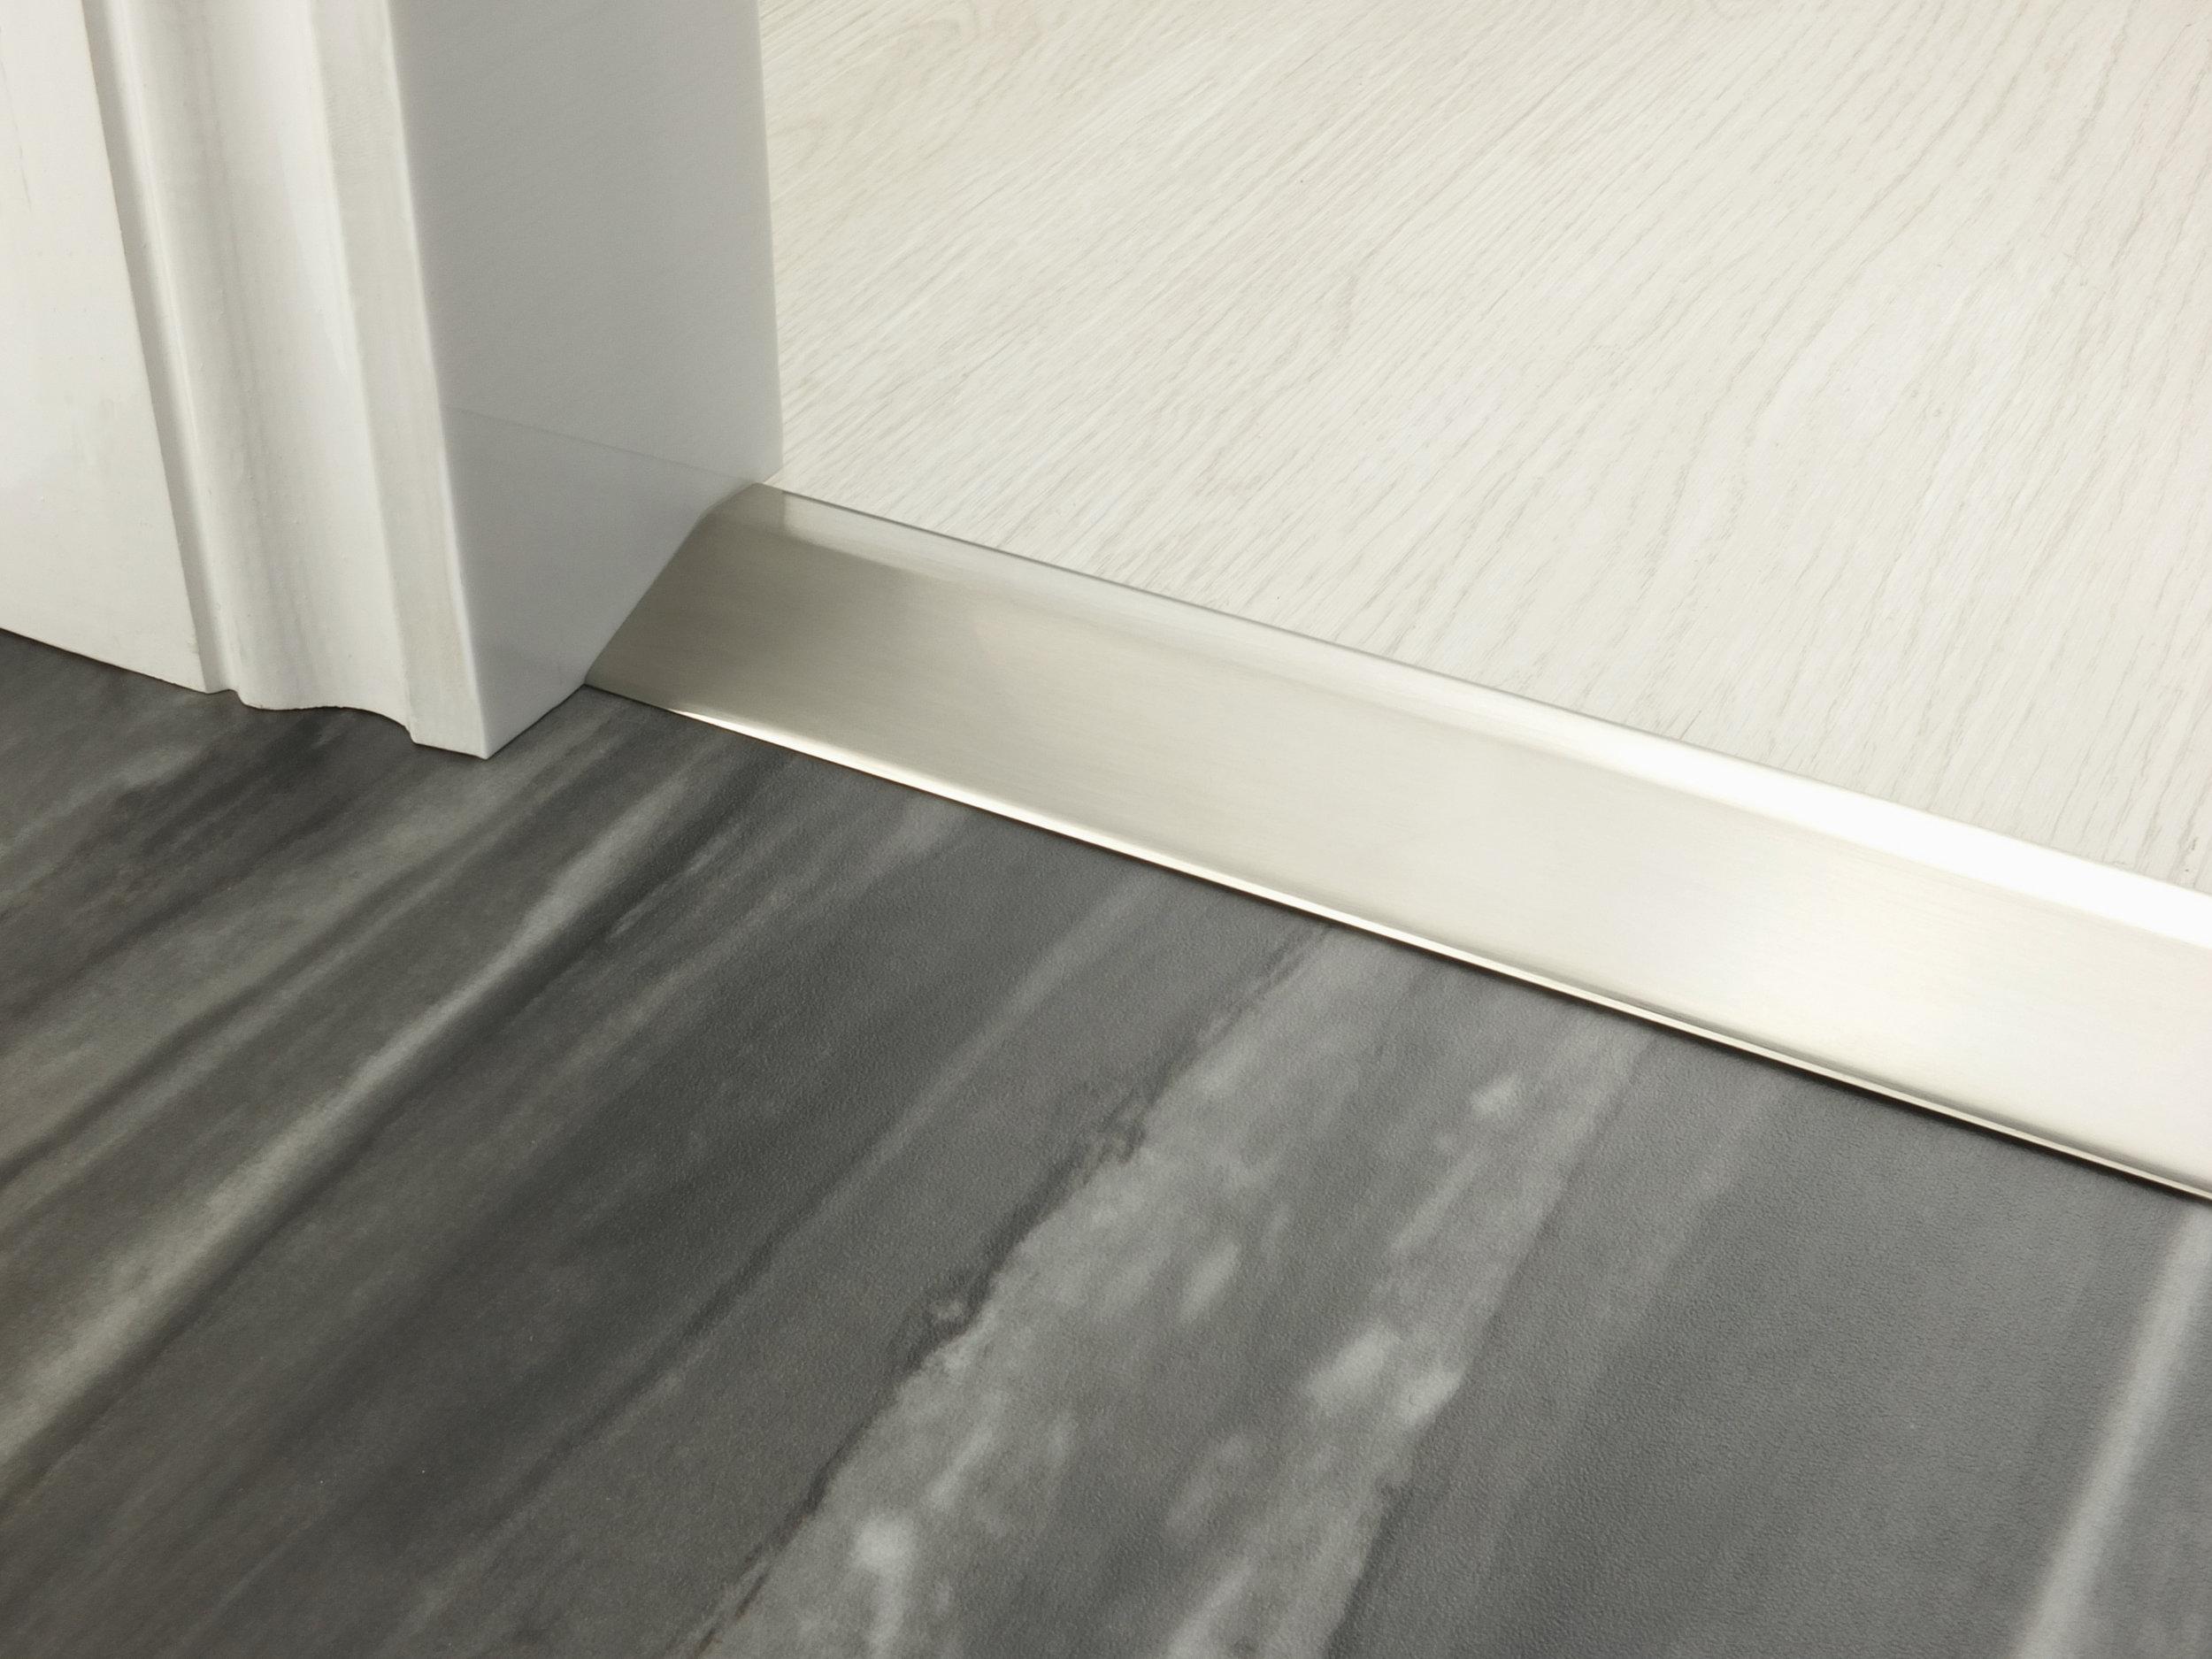 stairrods-doorbar-satin-nickel-16mm-ramp.jpg